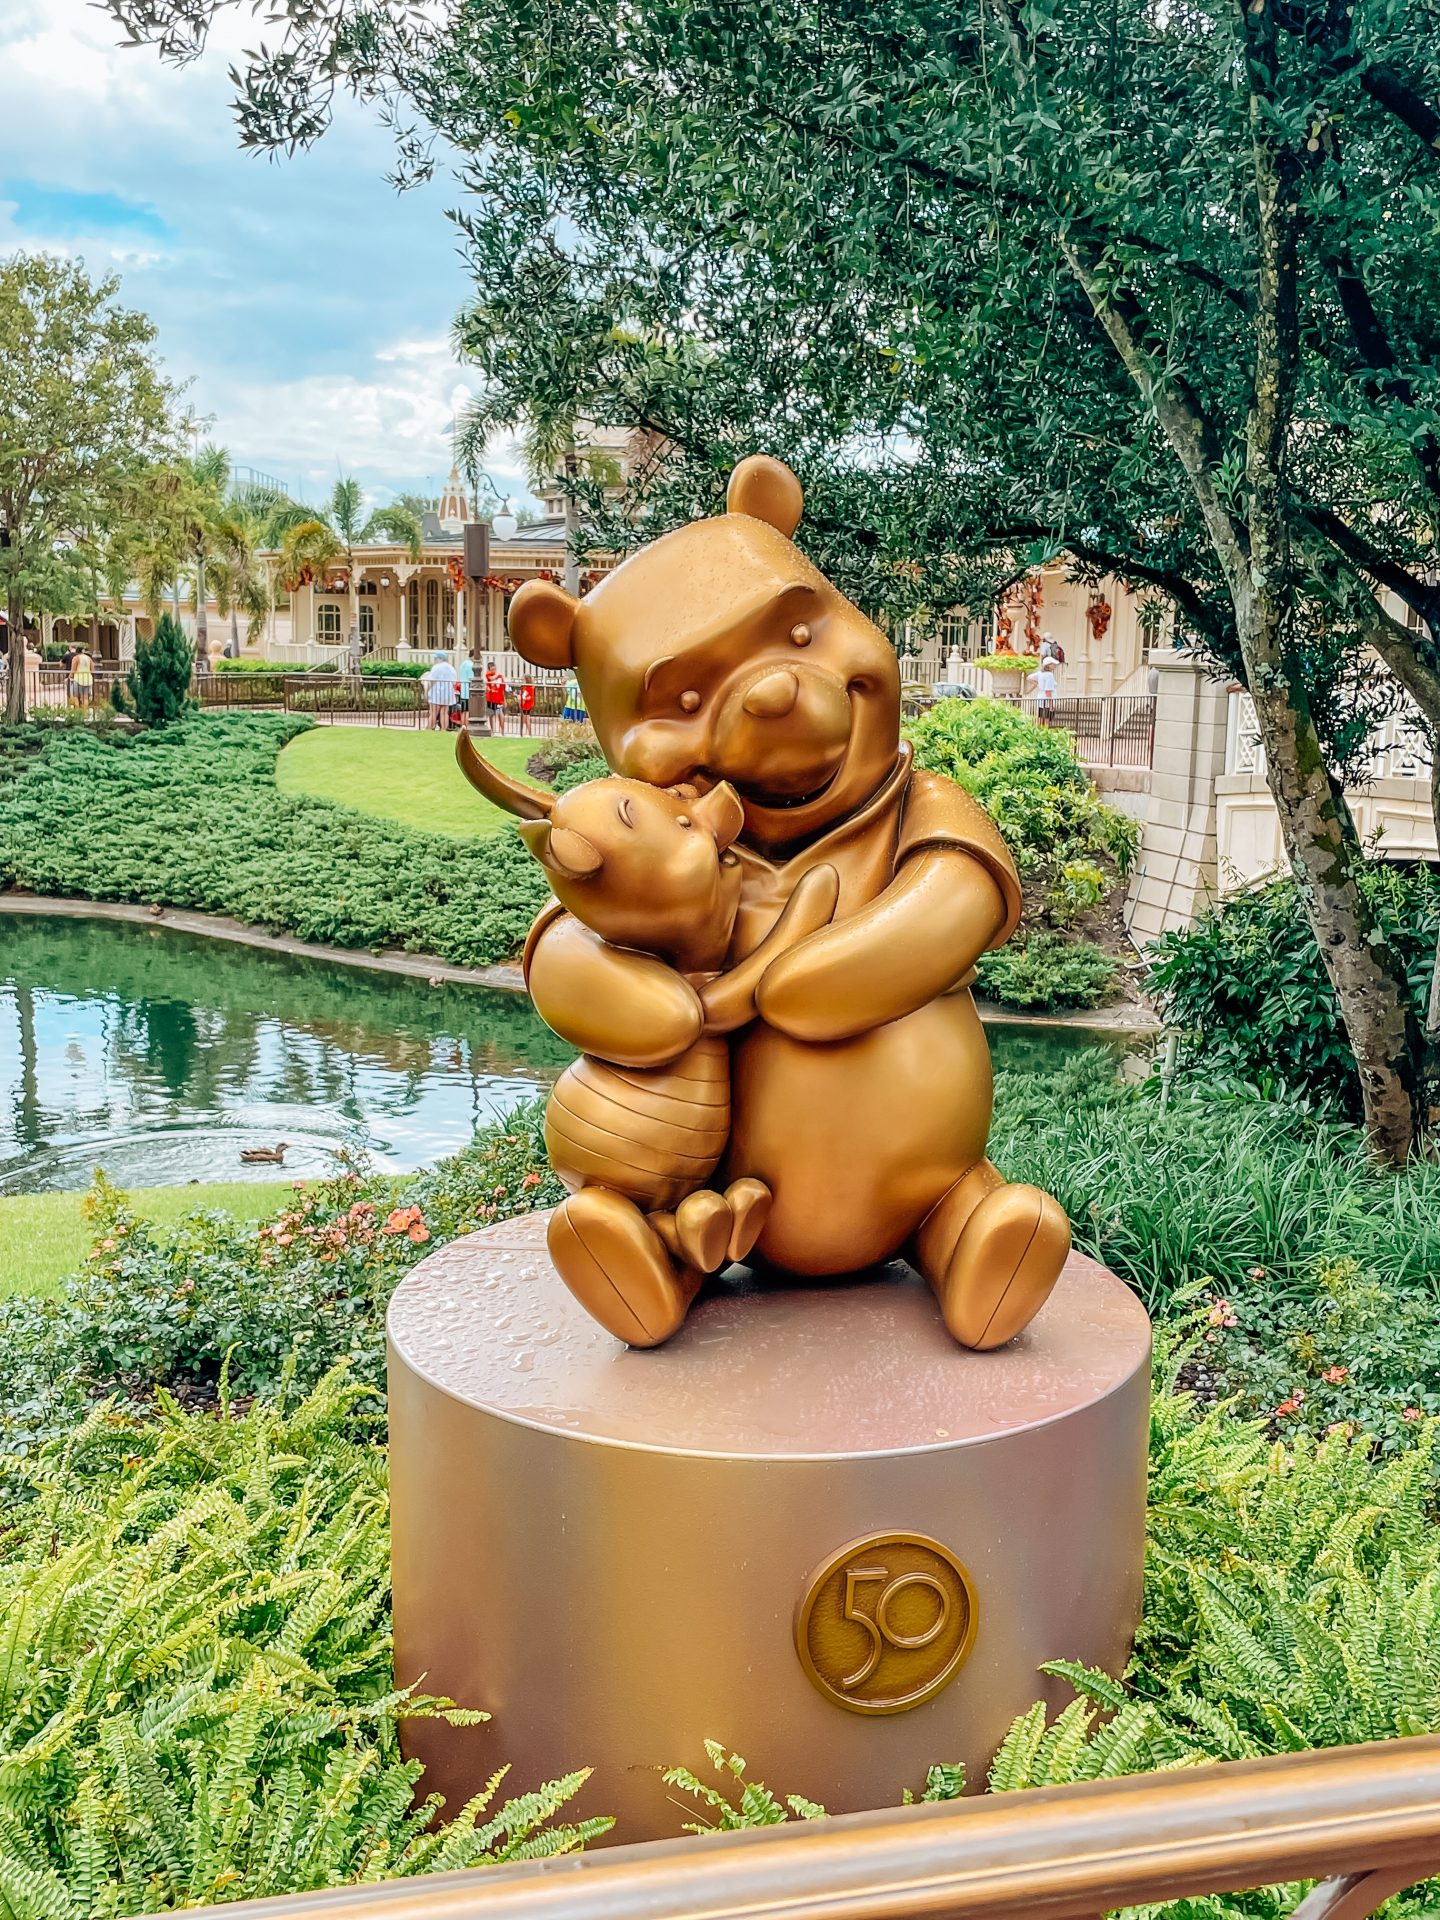 50th Anniversary Statues at Walt Disney World